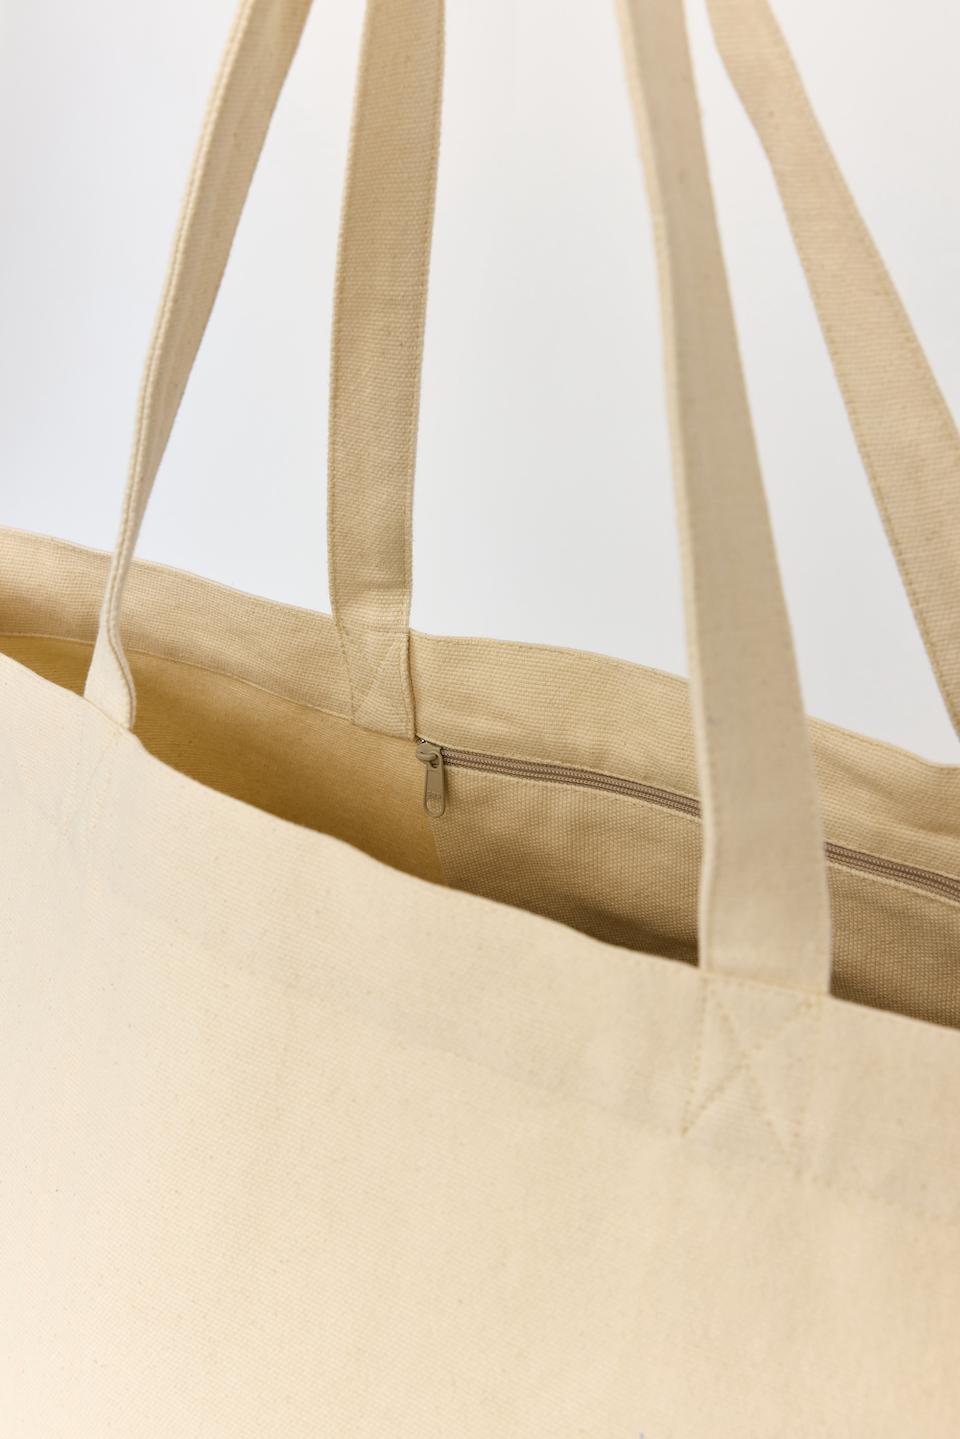 CPH BAG 015 recycle canvas butter - alternative 3